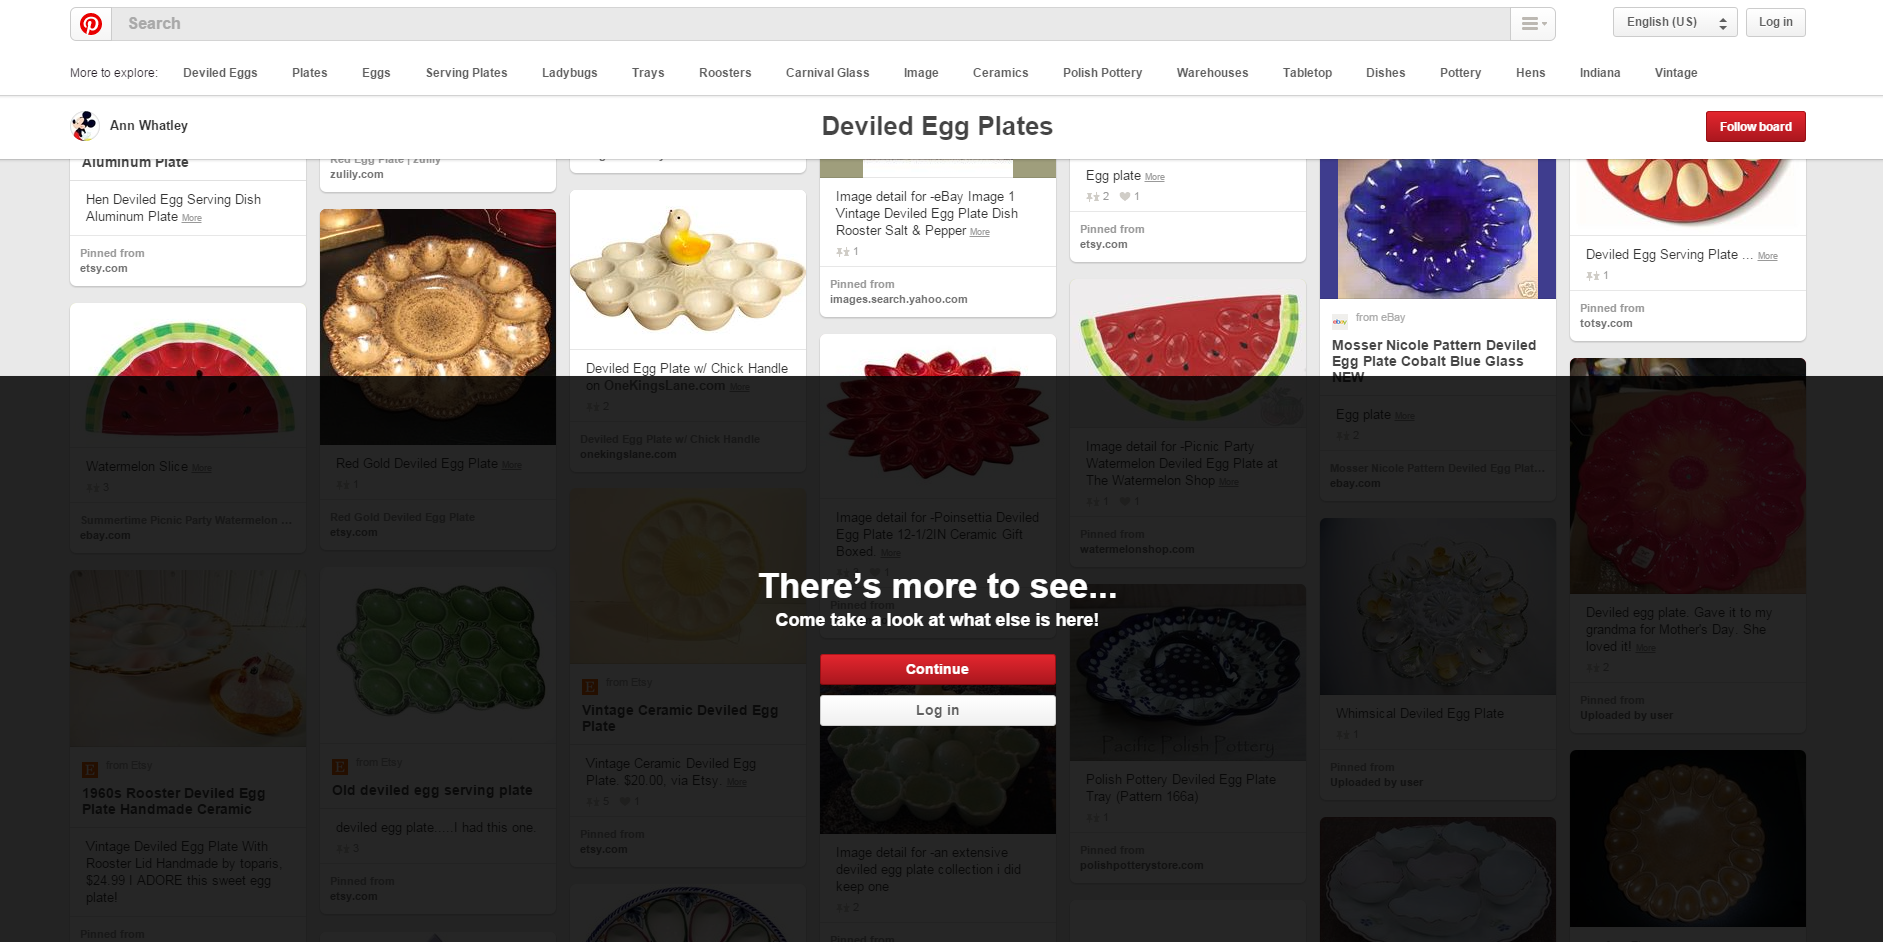 Pinterest prompt to login